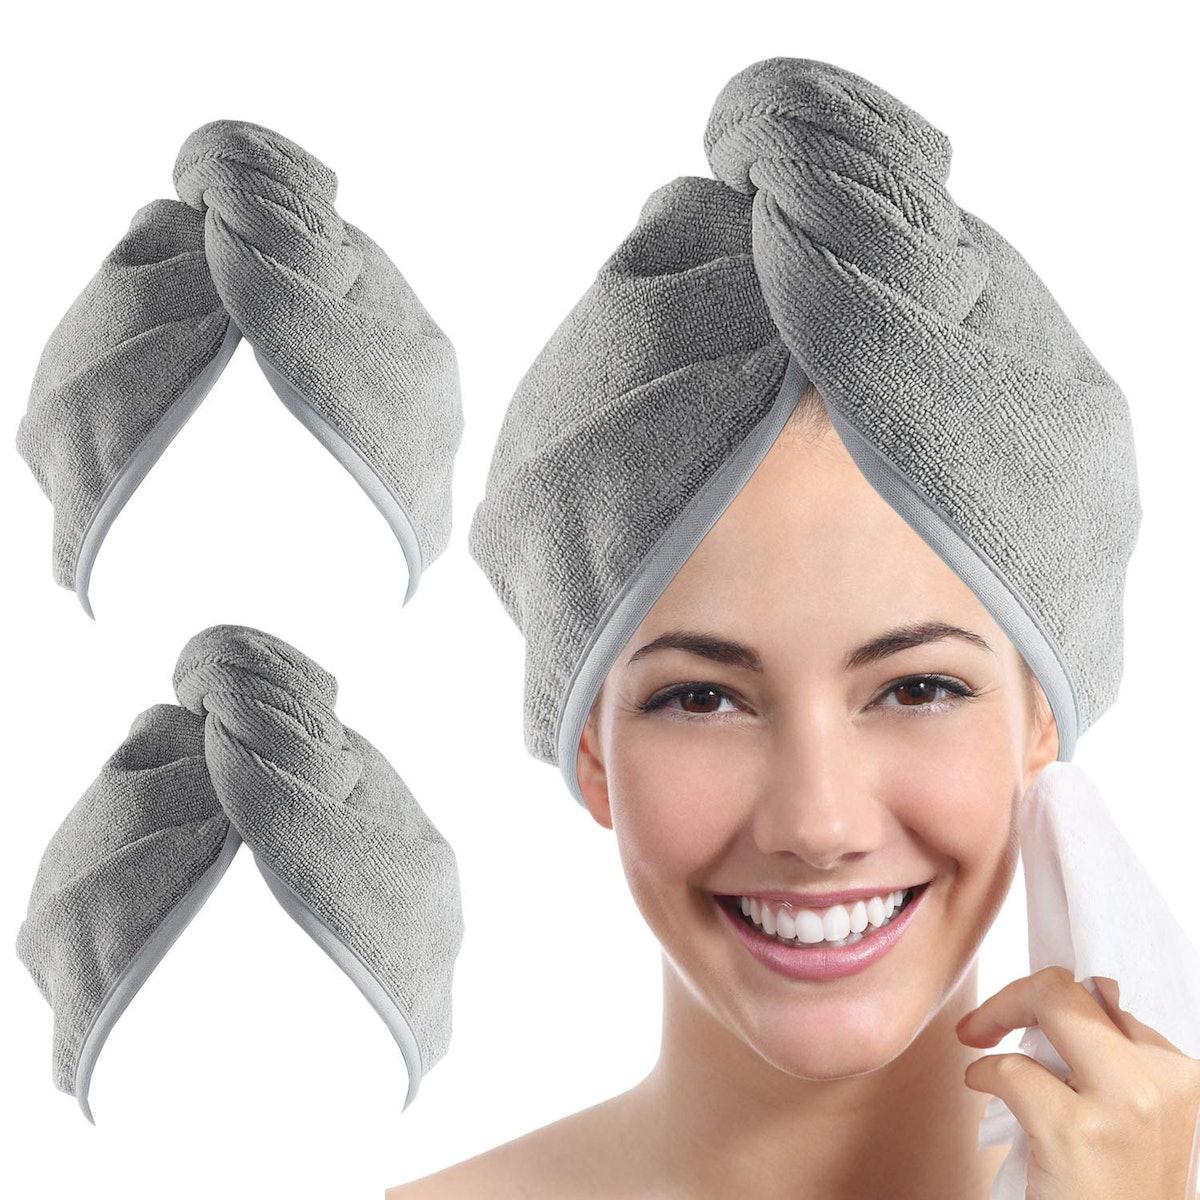 ToulerTex Quick Dry Hair Towel (2-Pack)